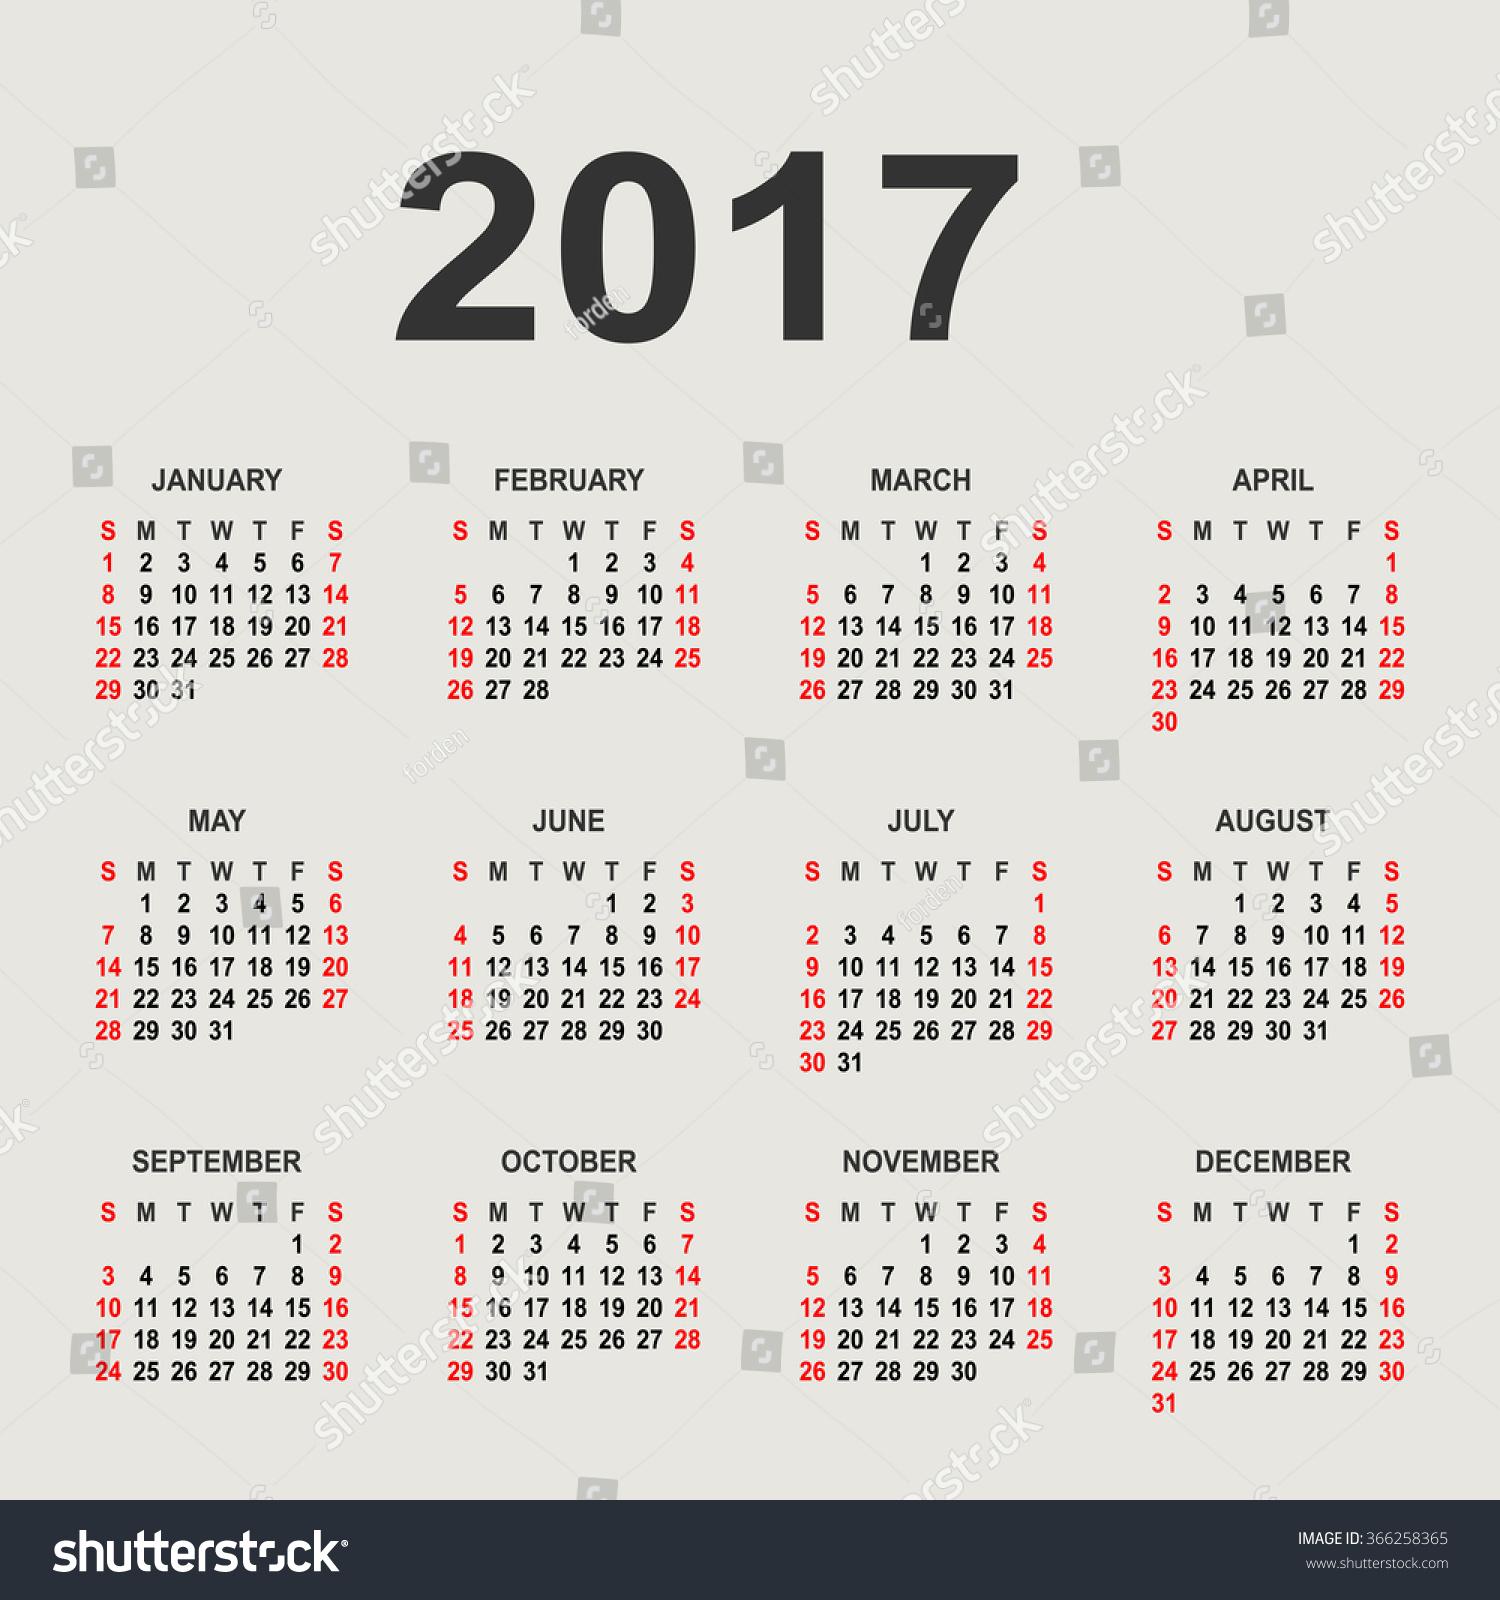 Calendar Background Vector : Calendar on grey background vector stock